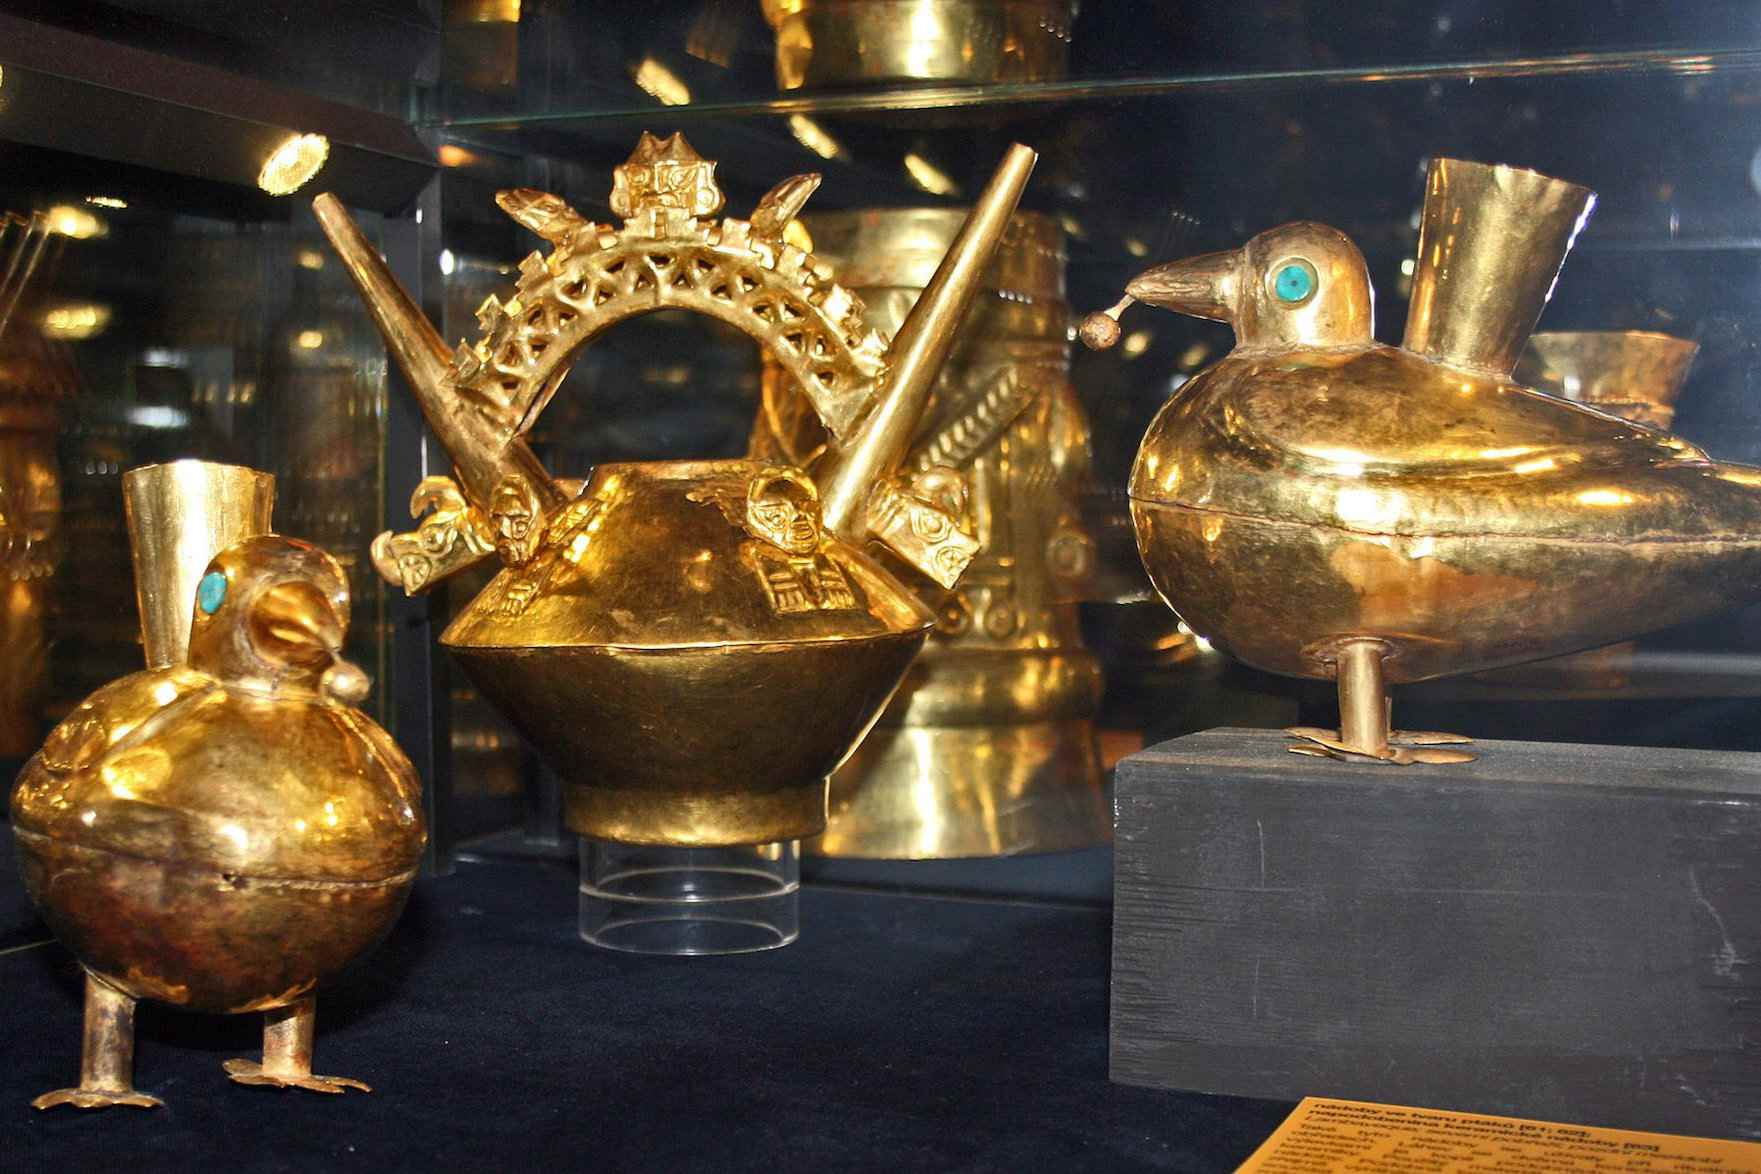 Prague Inka Gold exhibition